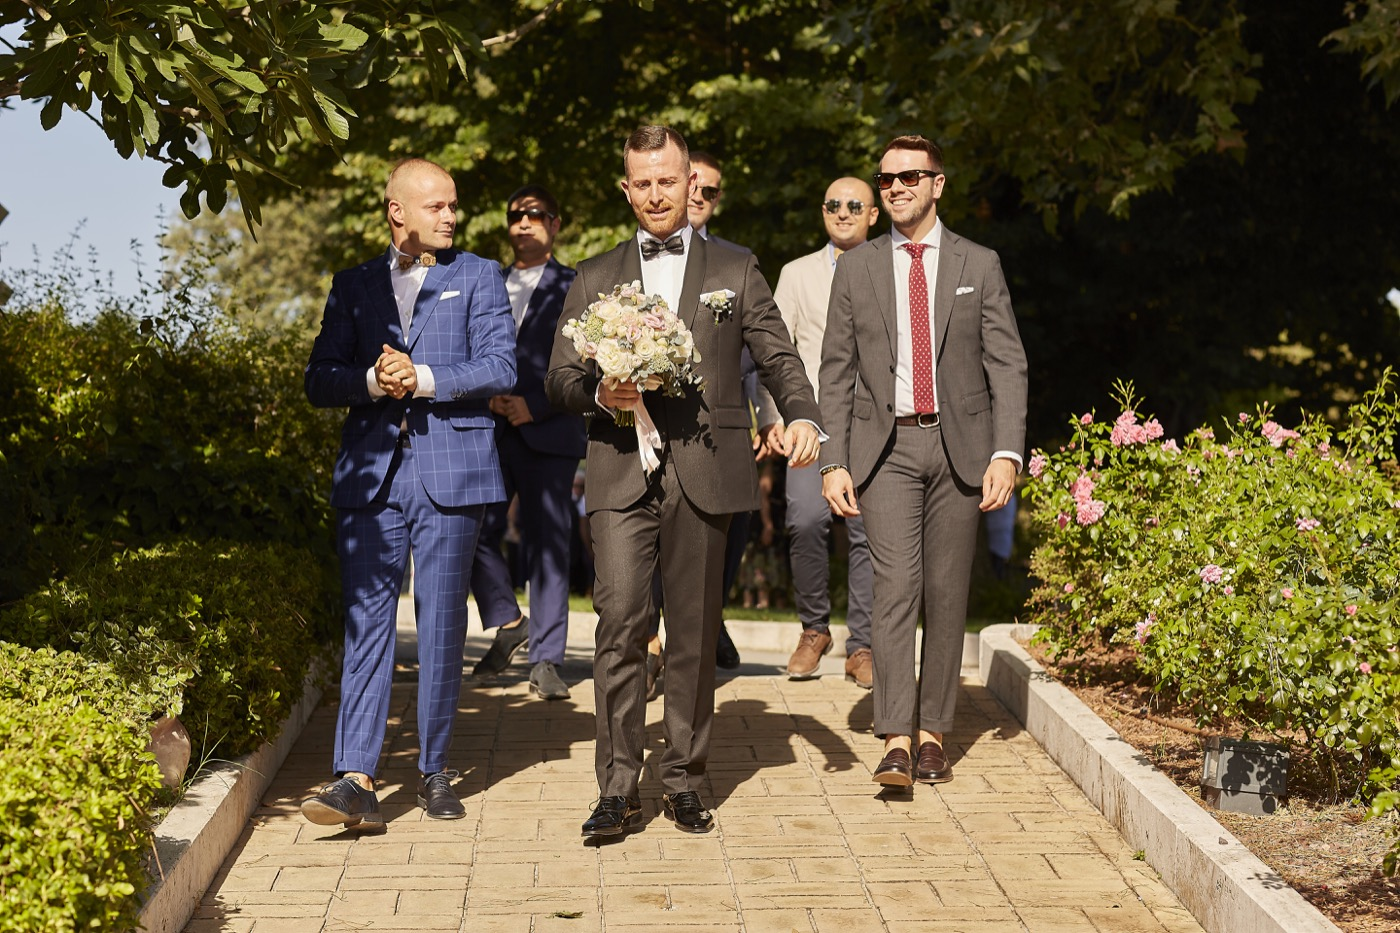 Claudio-Coppola-wedding-photographer-la-scuderia-eventi-preparativi-la-rosetta-perugia-39